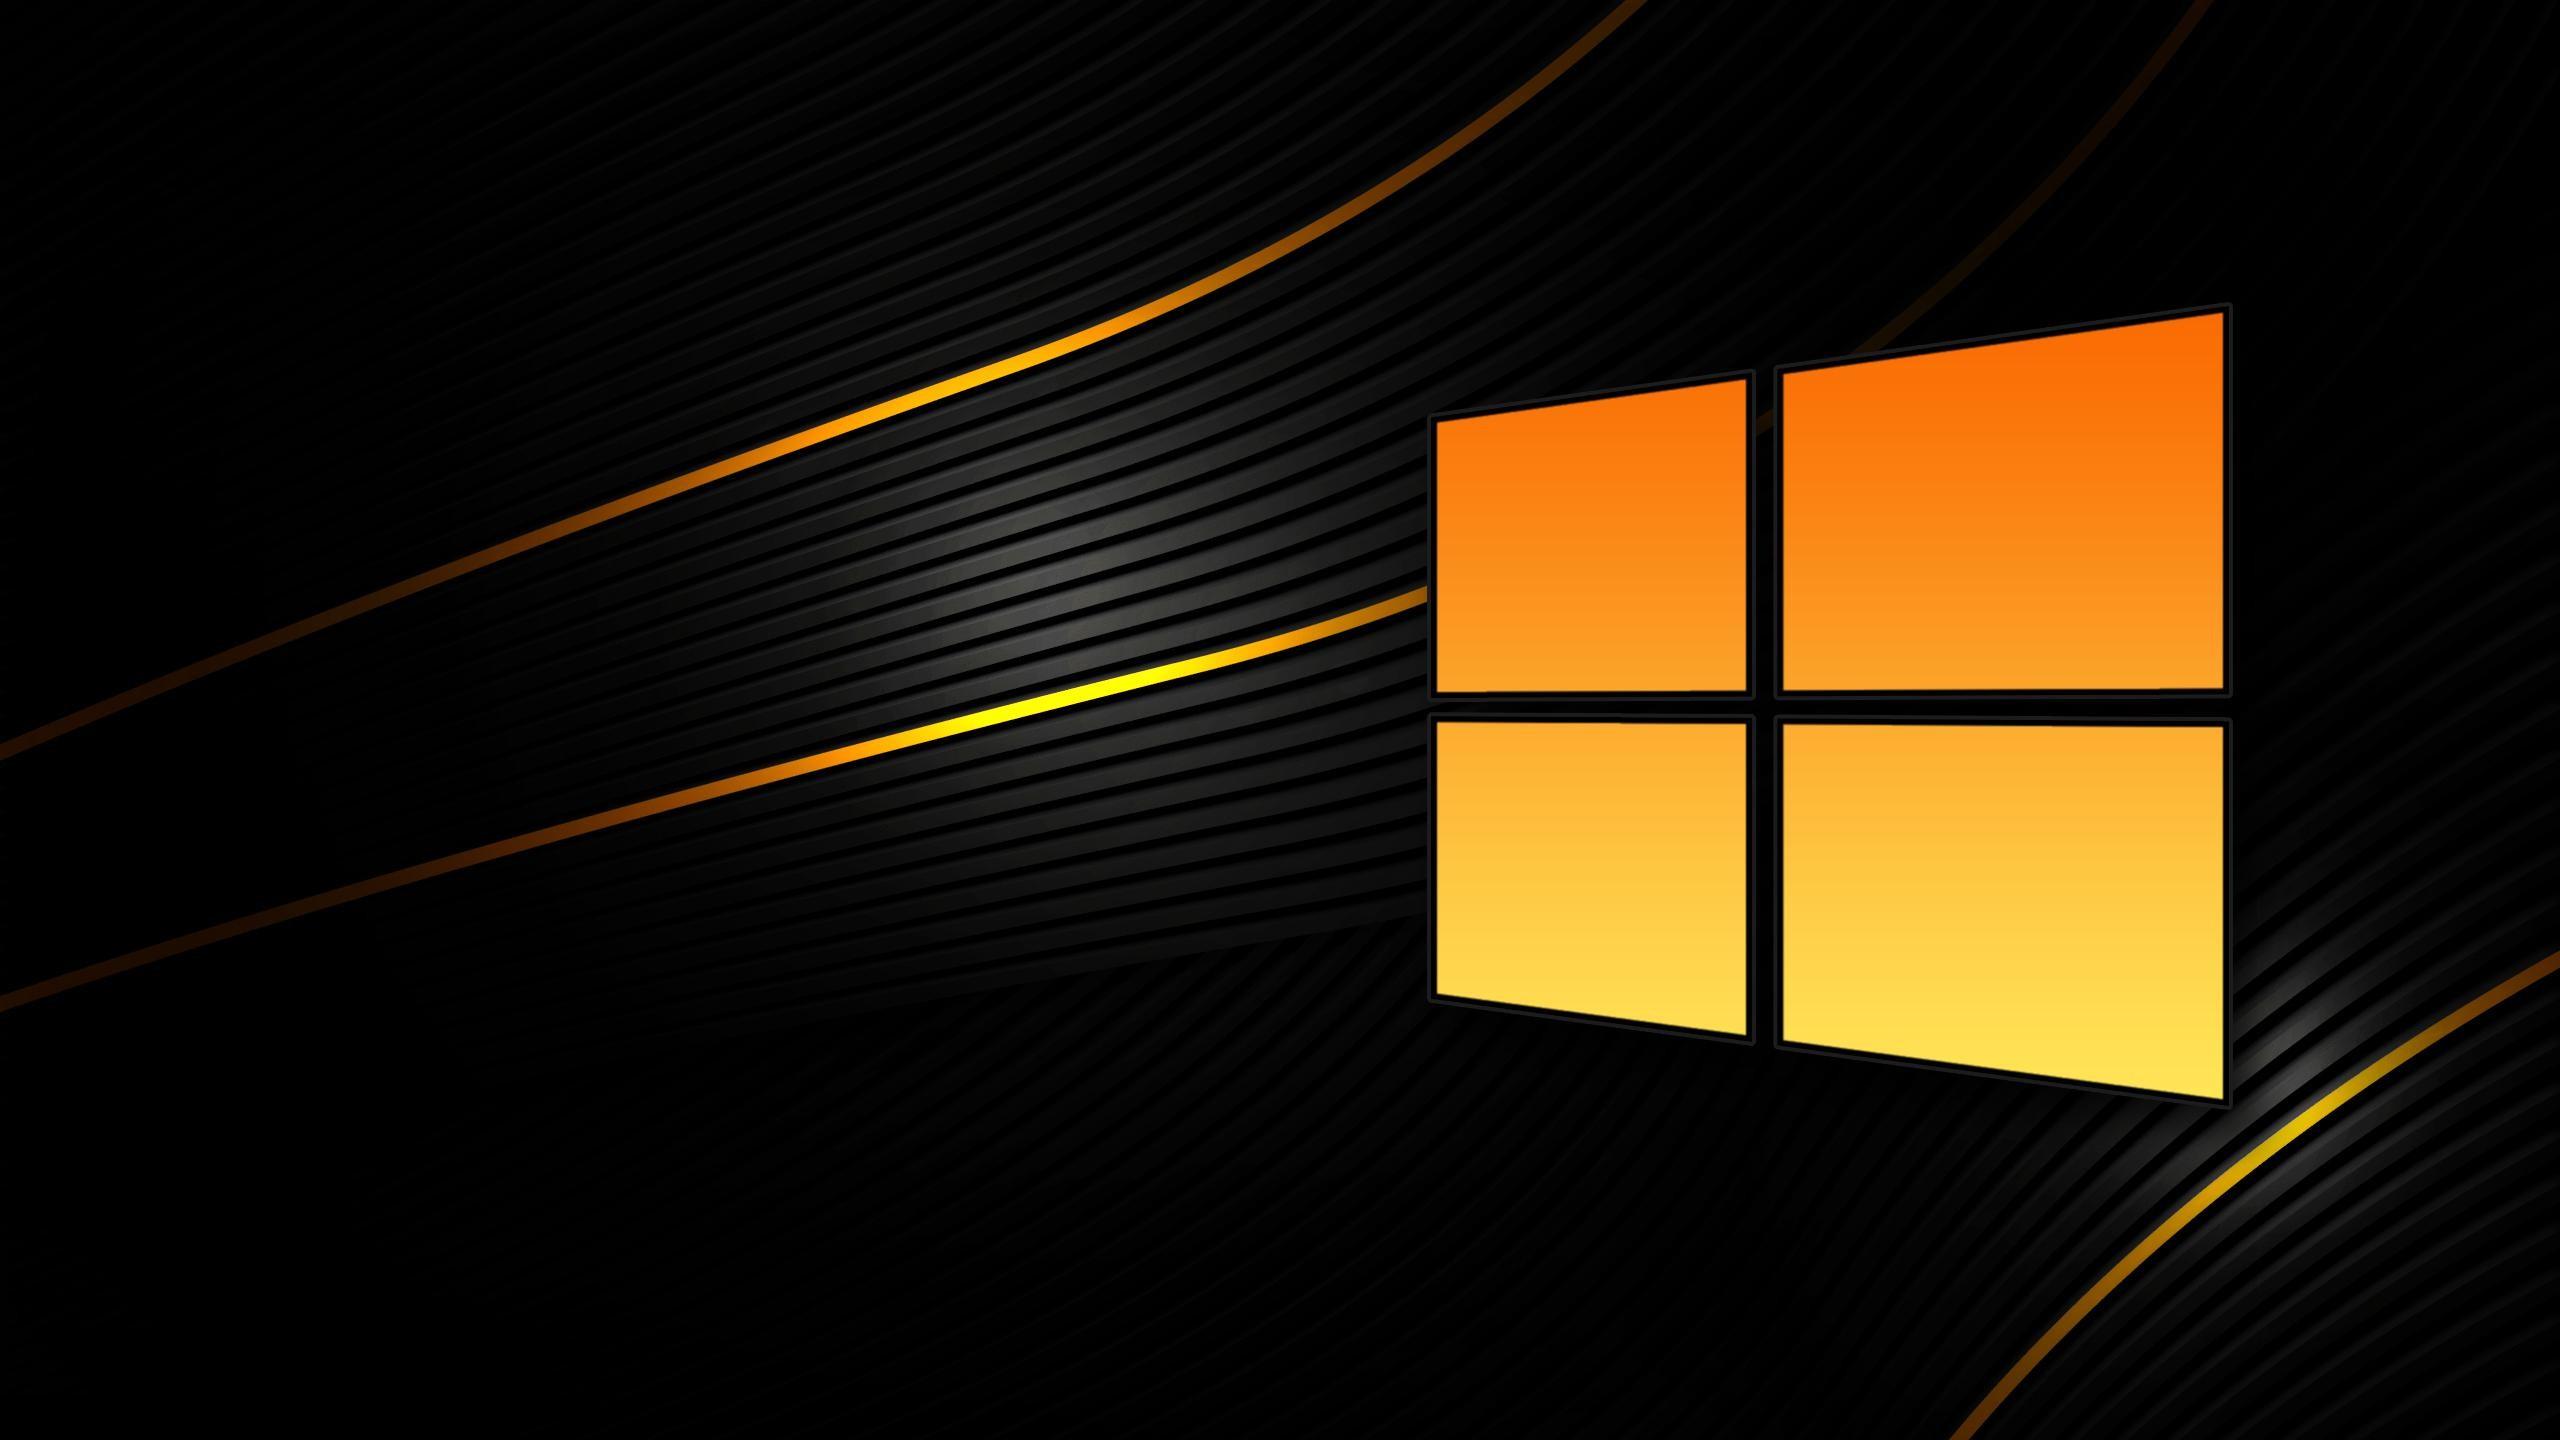 Cool-Windows-Group-wallpaper-wp6403973